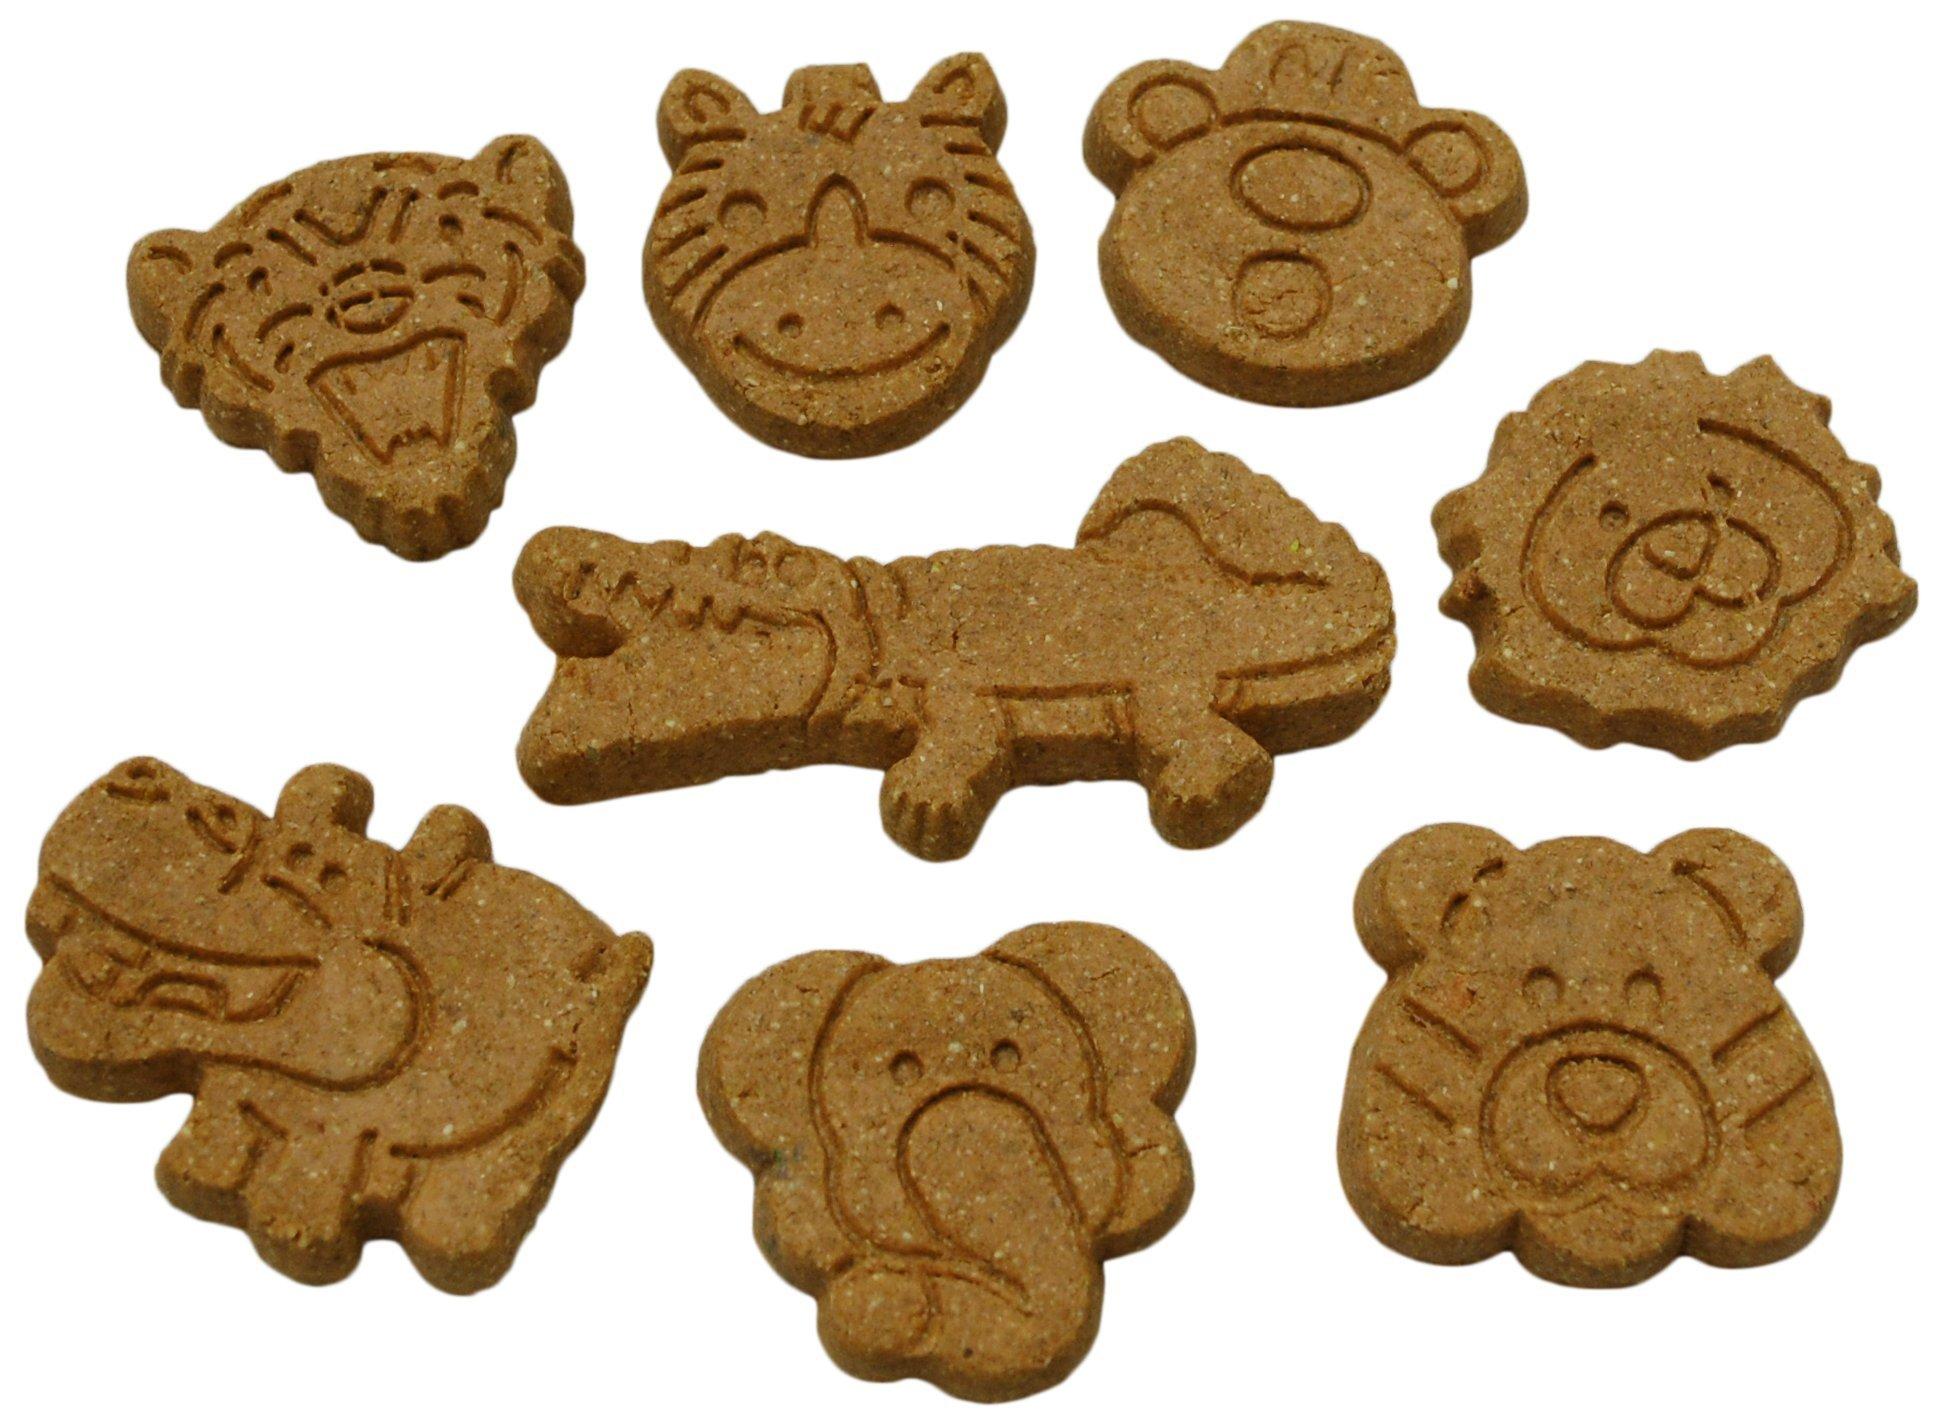 Howlin' Goodies Dog Treats, Made in USA, 100% All Natural Organic Ingrediants, Sweet Potato Jungle Animals, 10lb Bulk Box